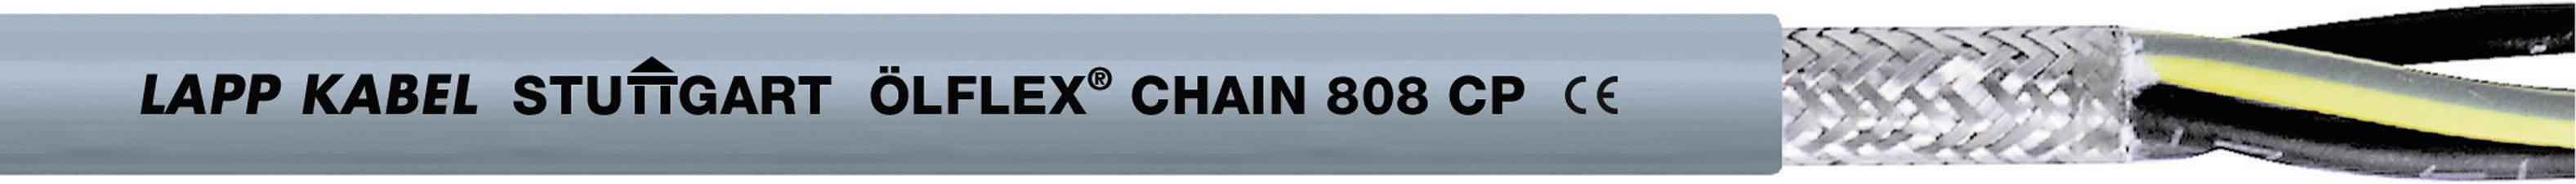 Žíla kabelu LappKabel ÖLFLEX CHAIN 808 CP 3G1,5 (1027776), 3x 1,5 mm², polyurethan, Ø 7,5 mm, stíněný, 50 m, š